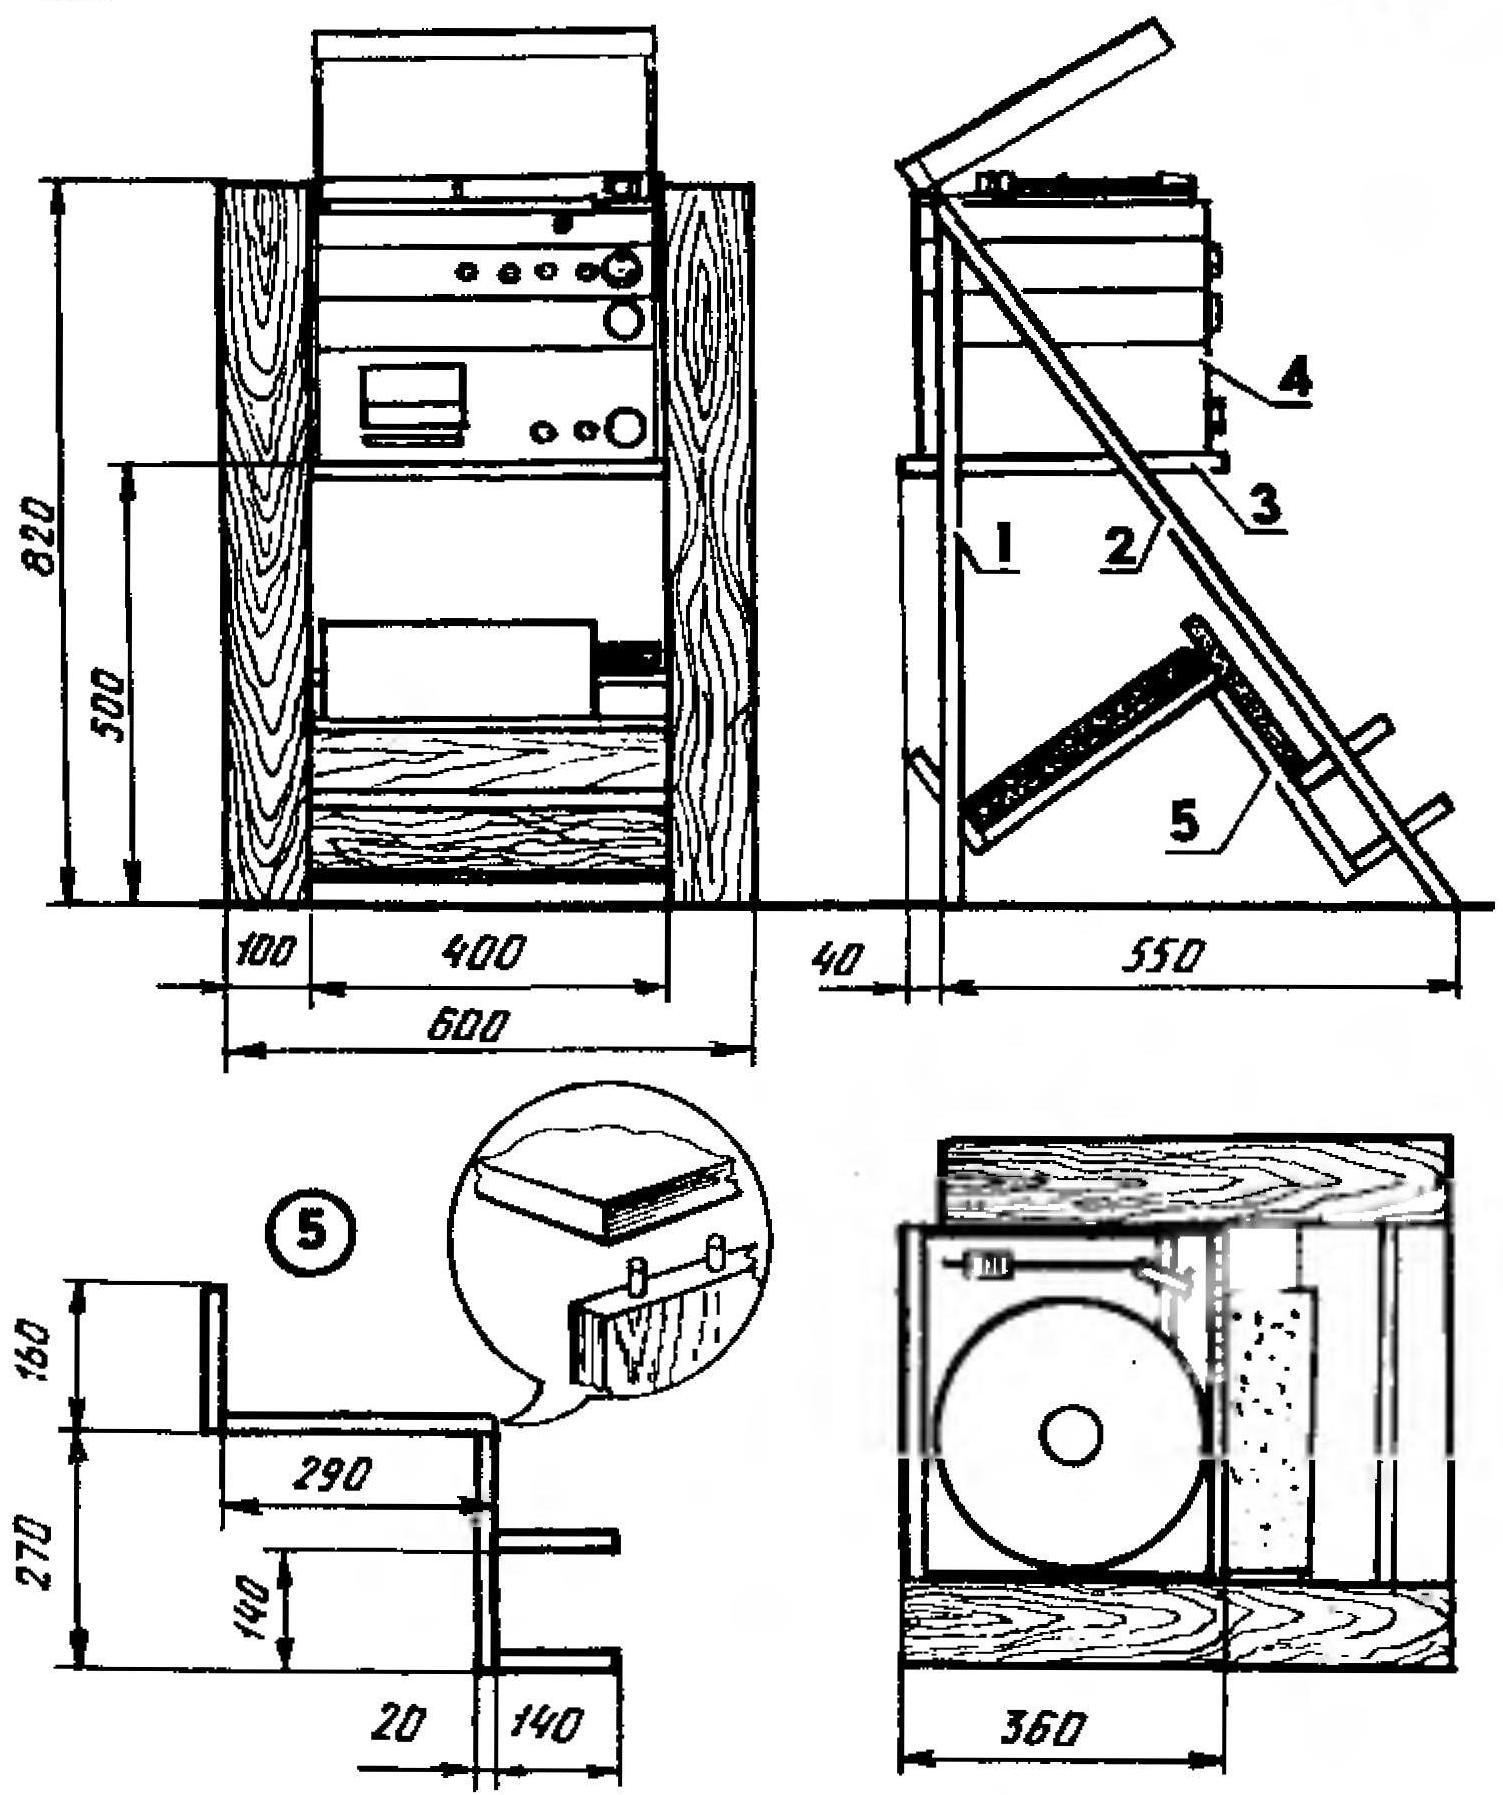 Fig. 3. Wardrobe-step ladder